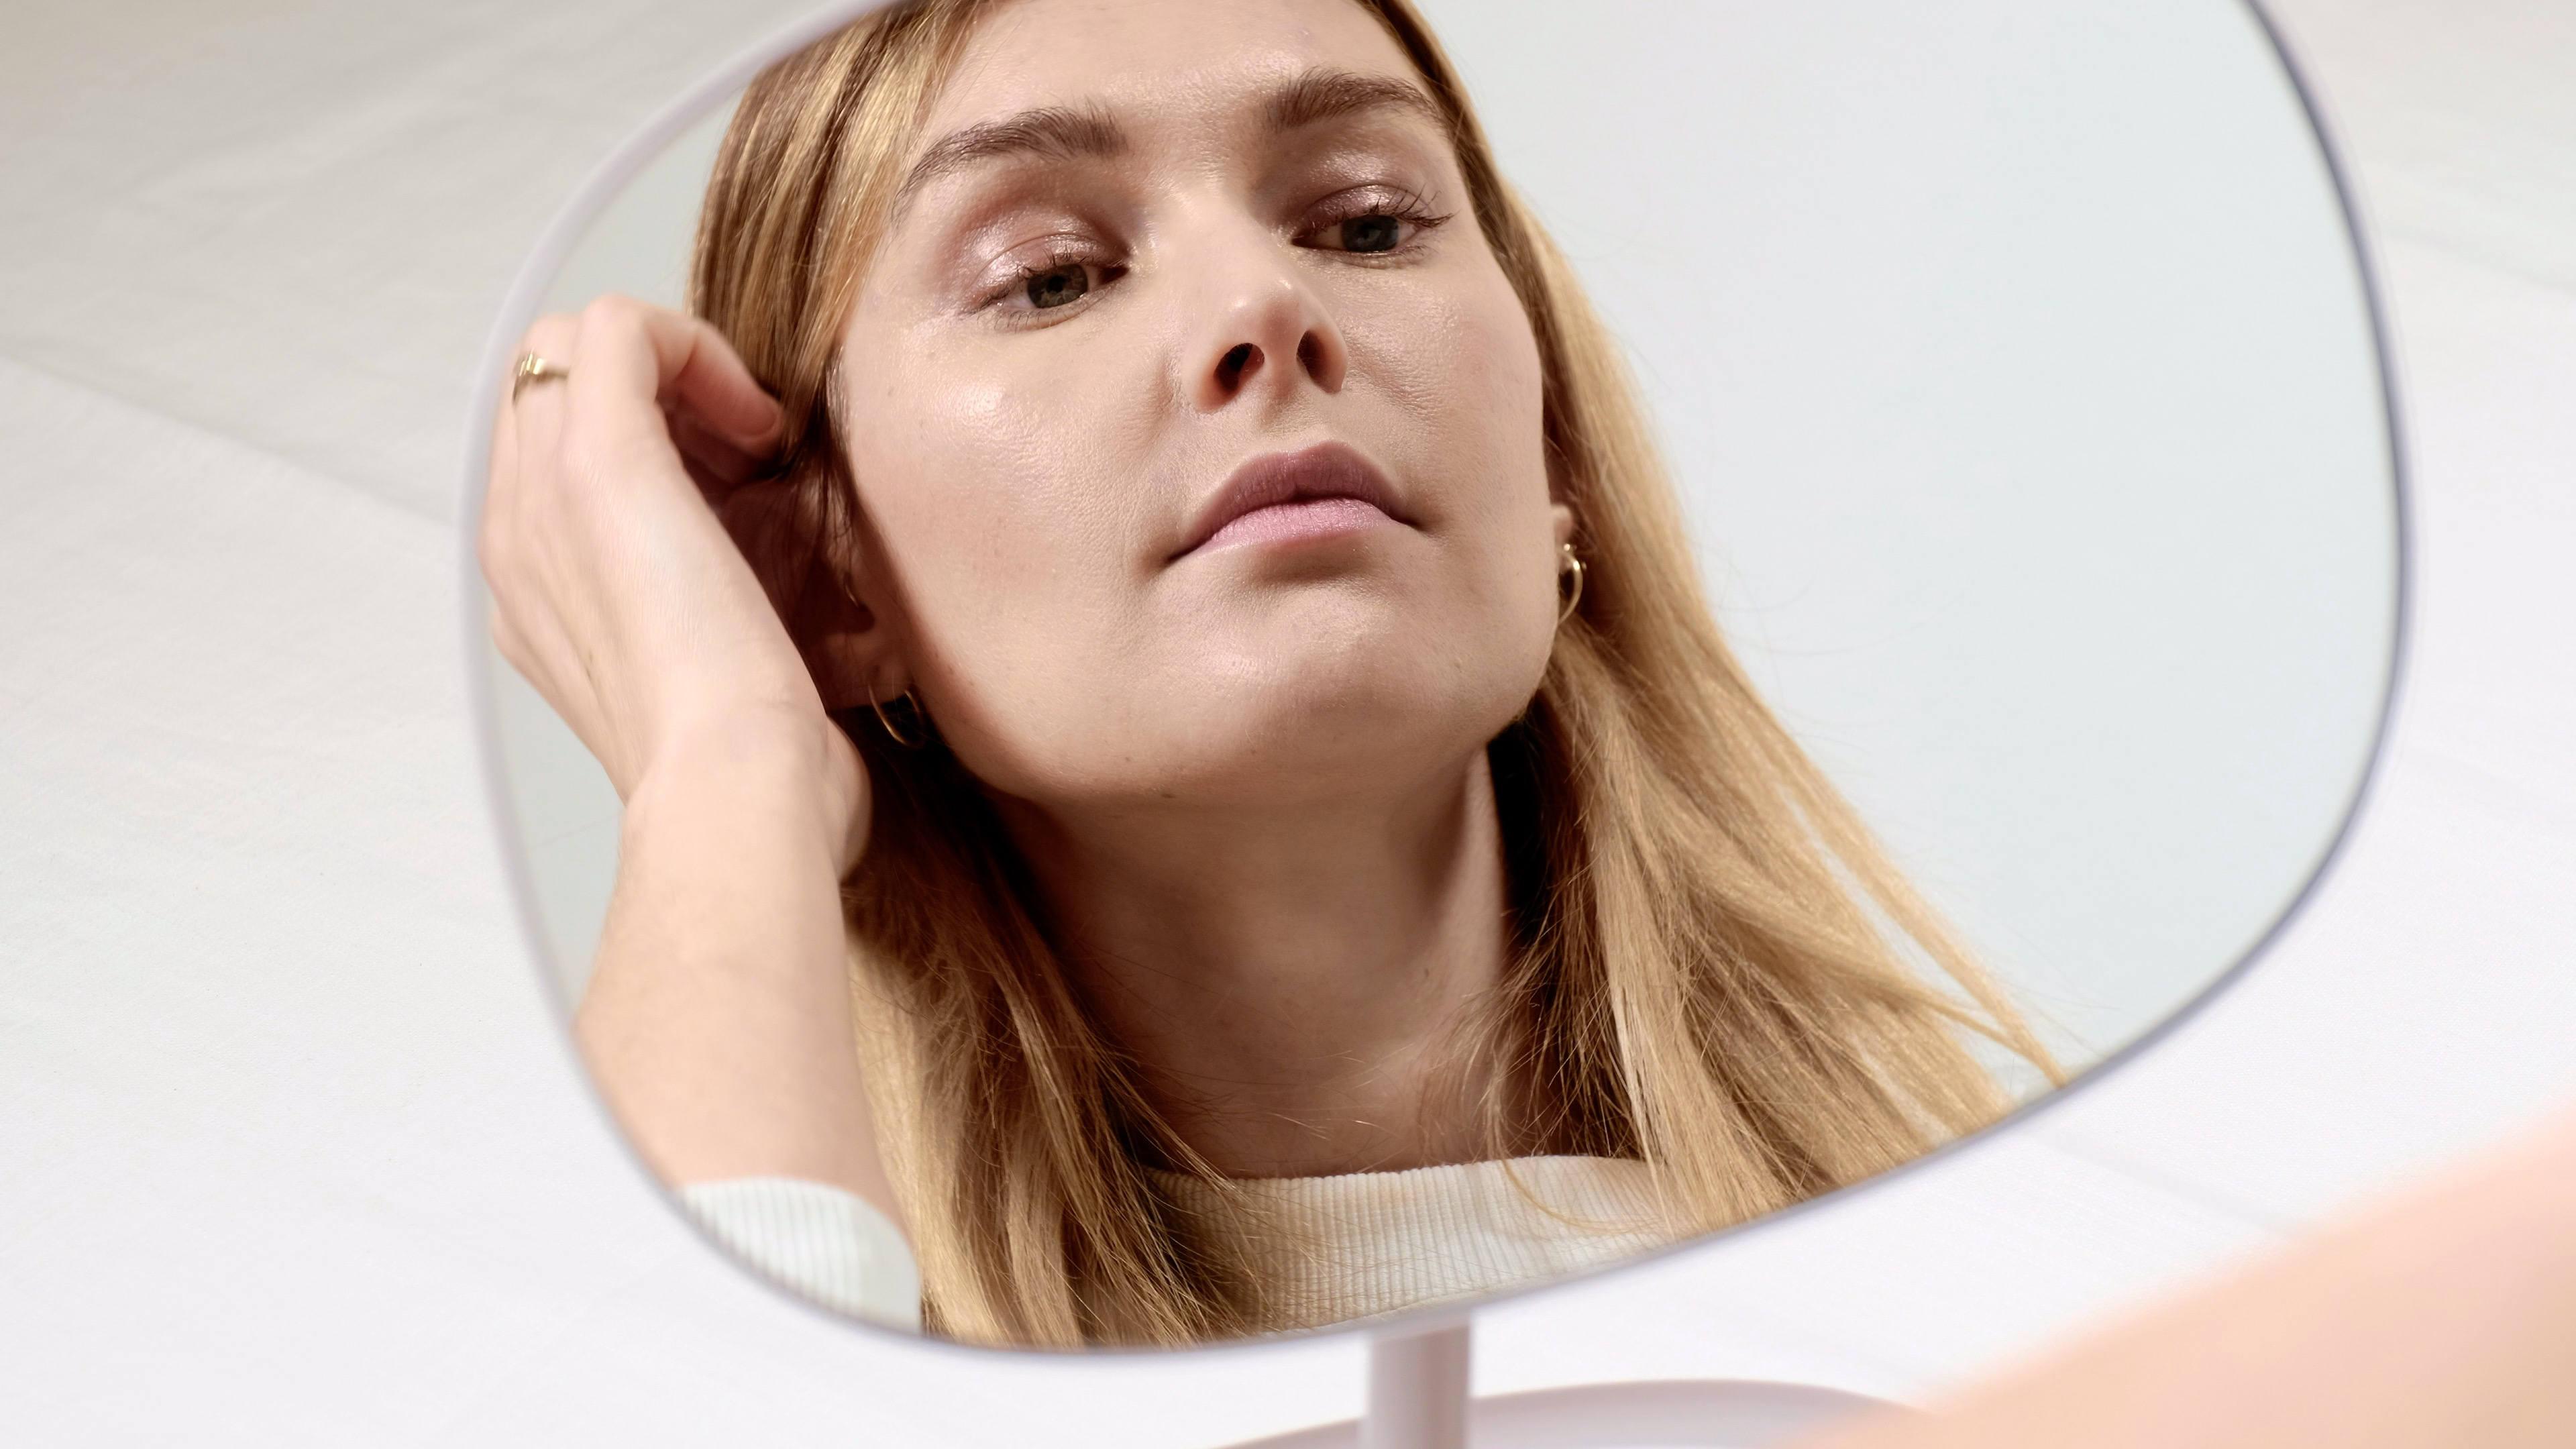 Beautyblog Beautyblogger BARE MINDS Elina Neumann DIY Honig Gesichtsmaske 0